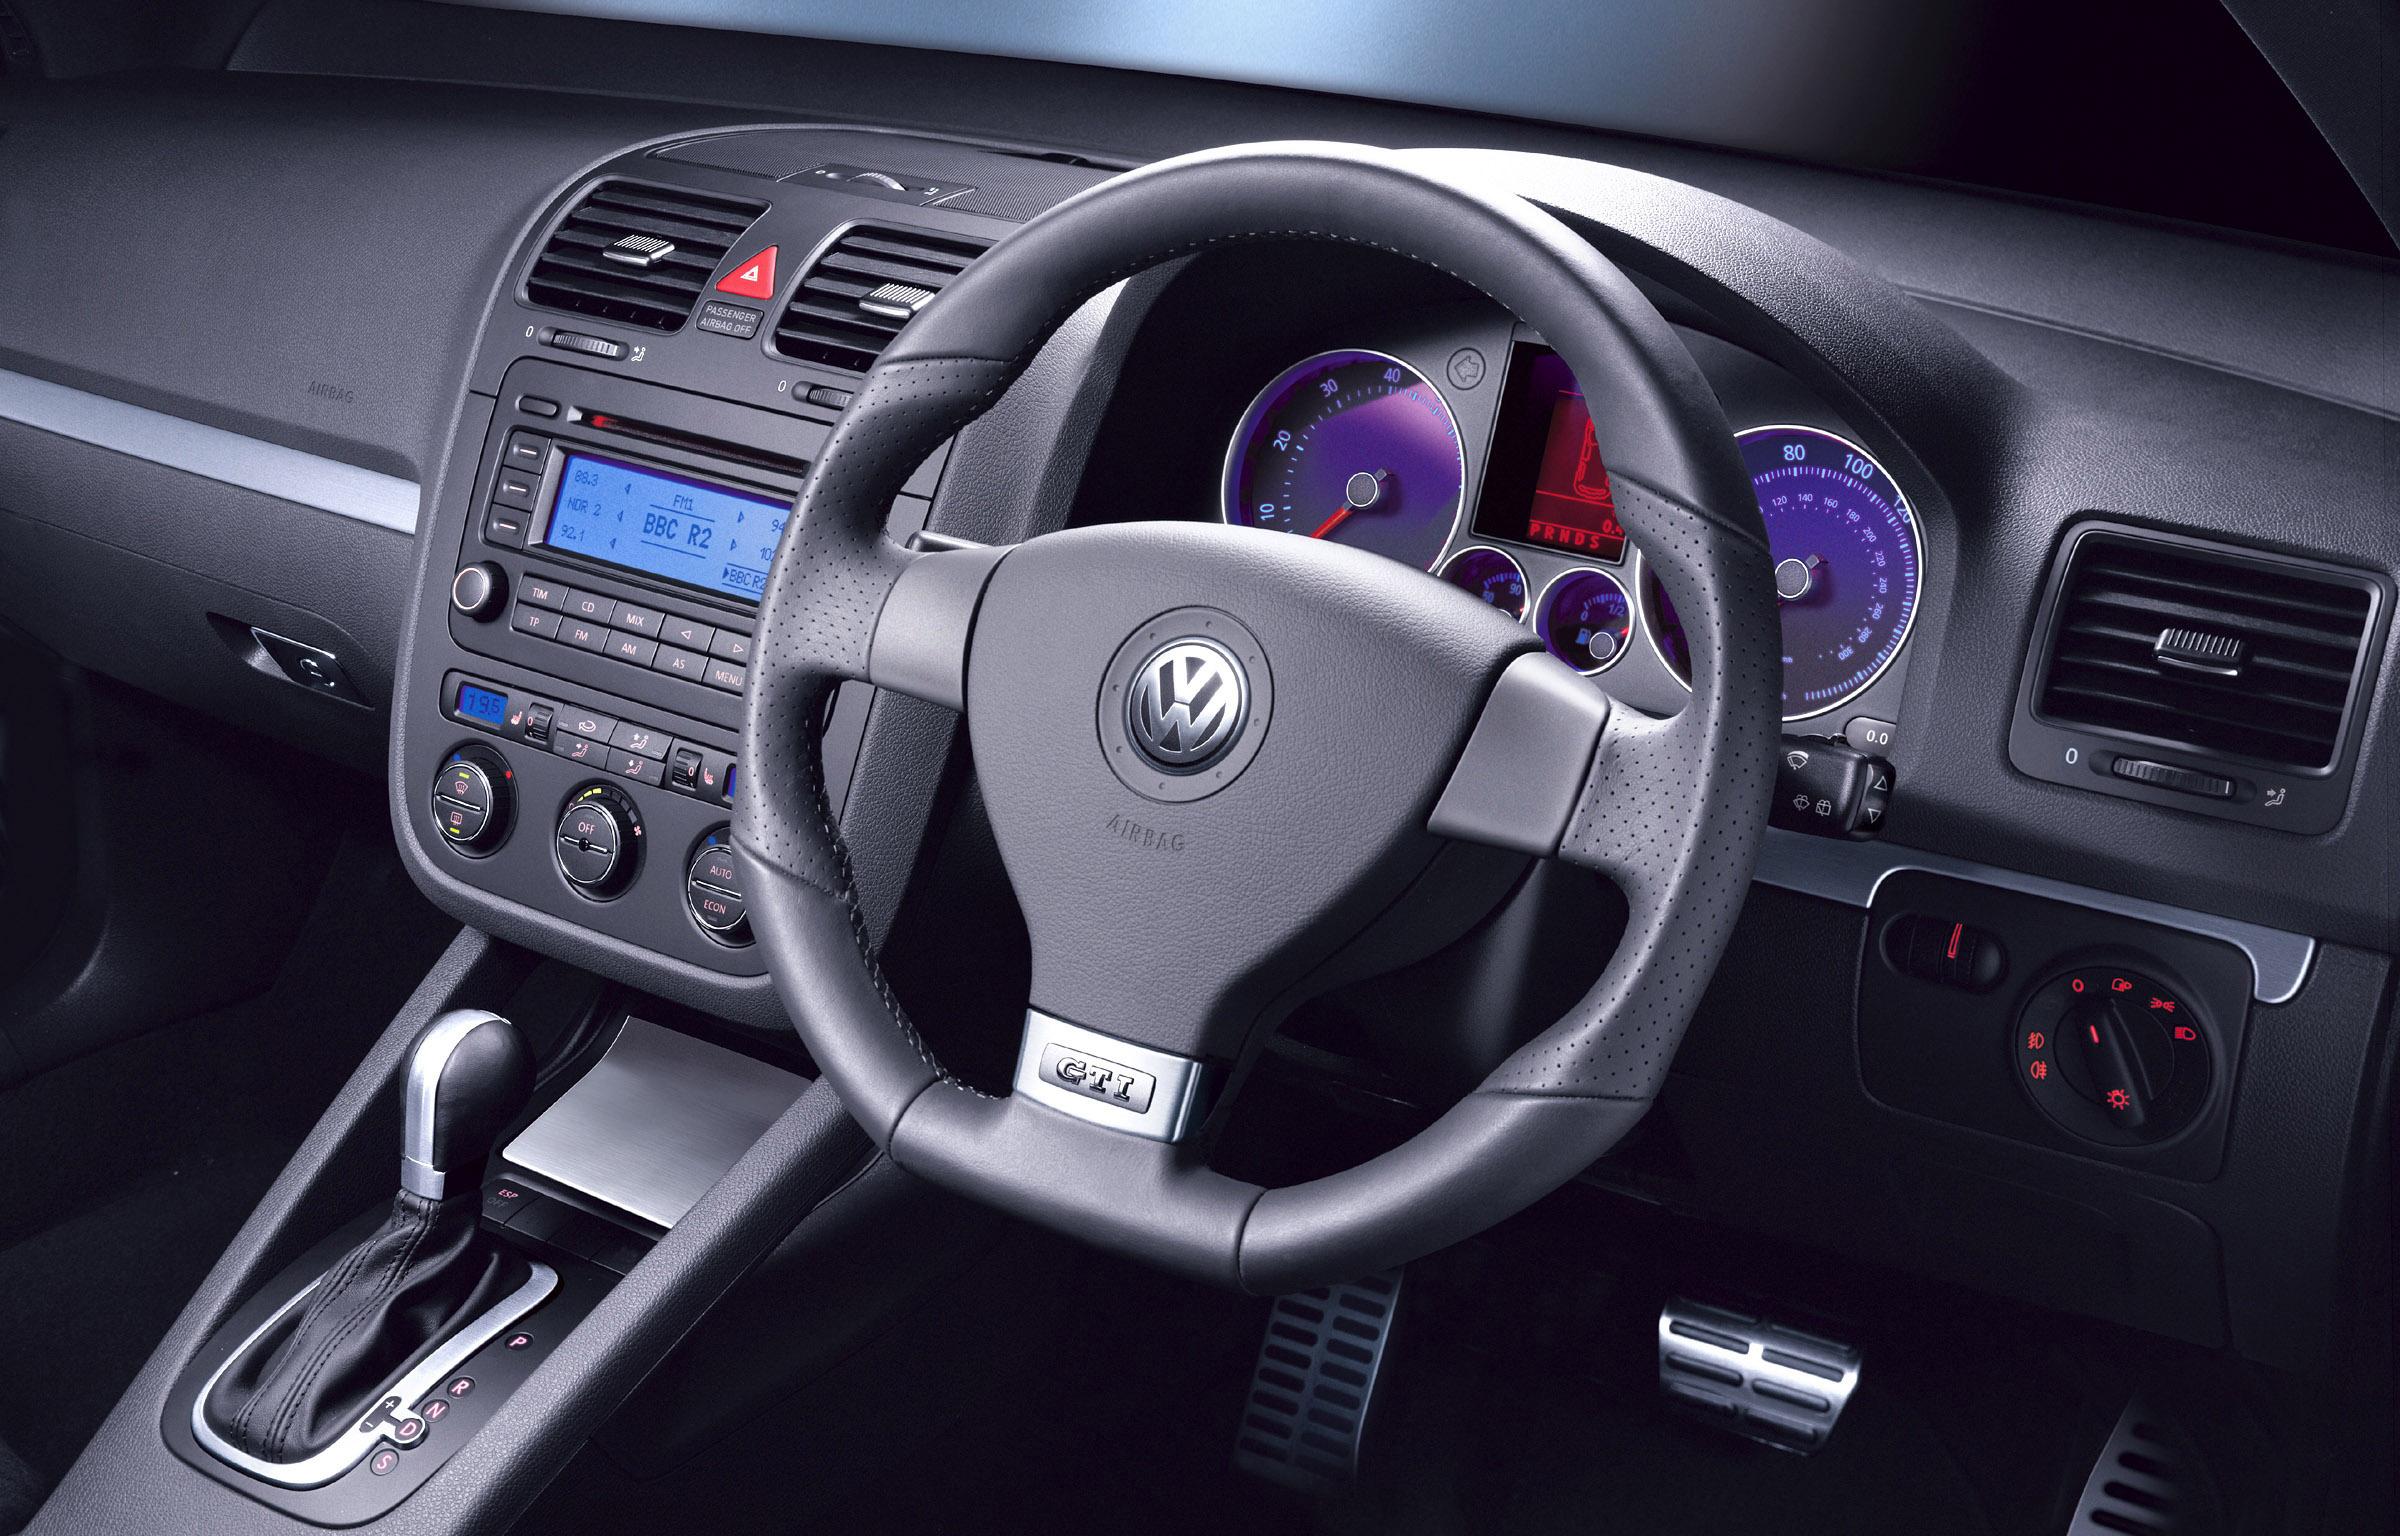 2004 Volkswagen Golf Gti Picture 71723